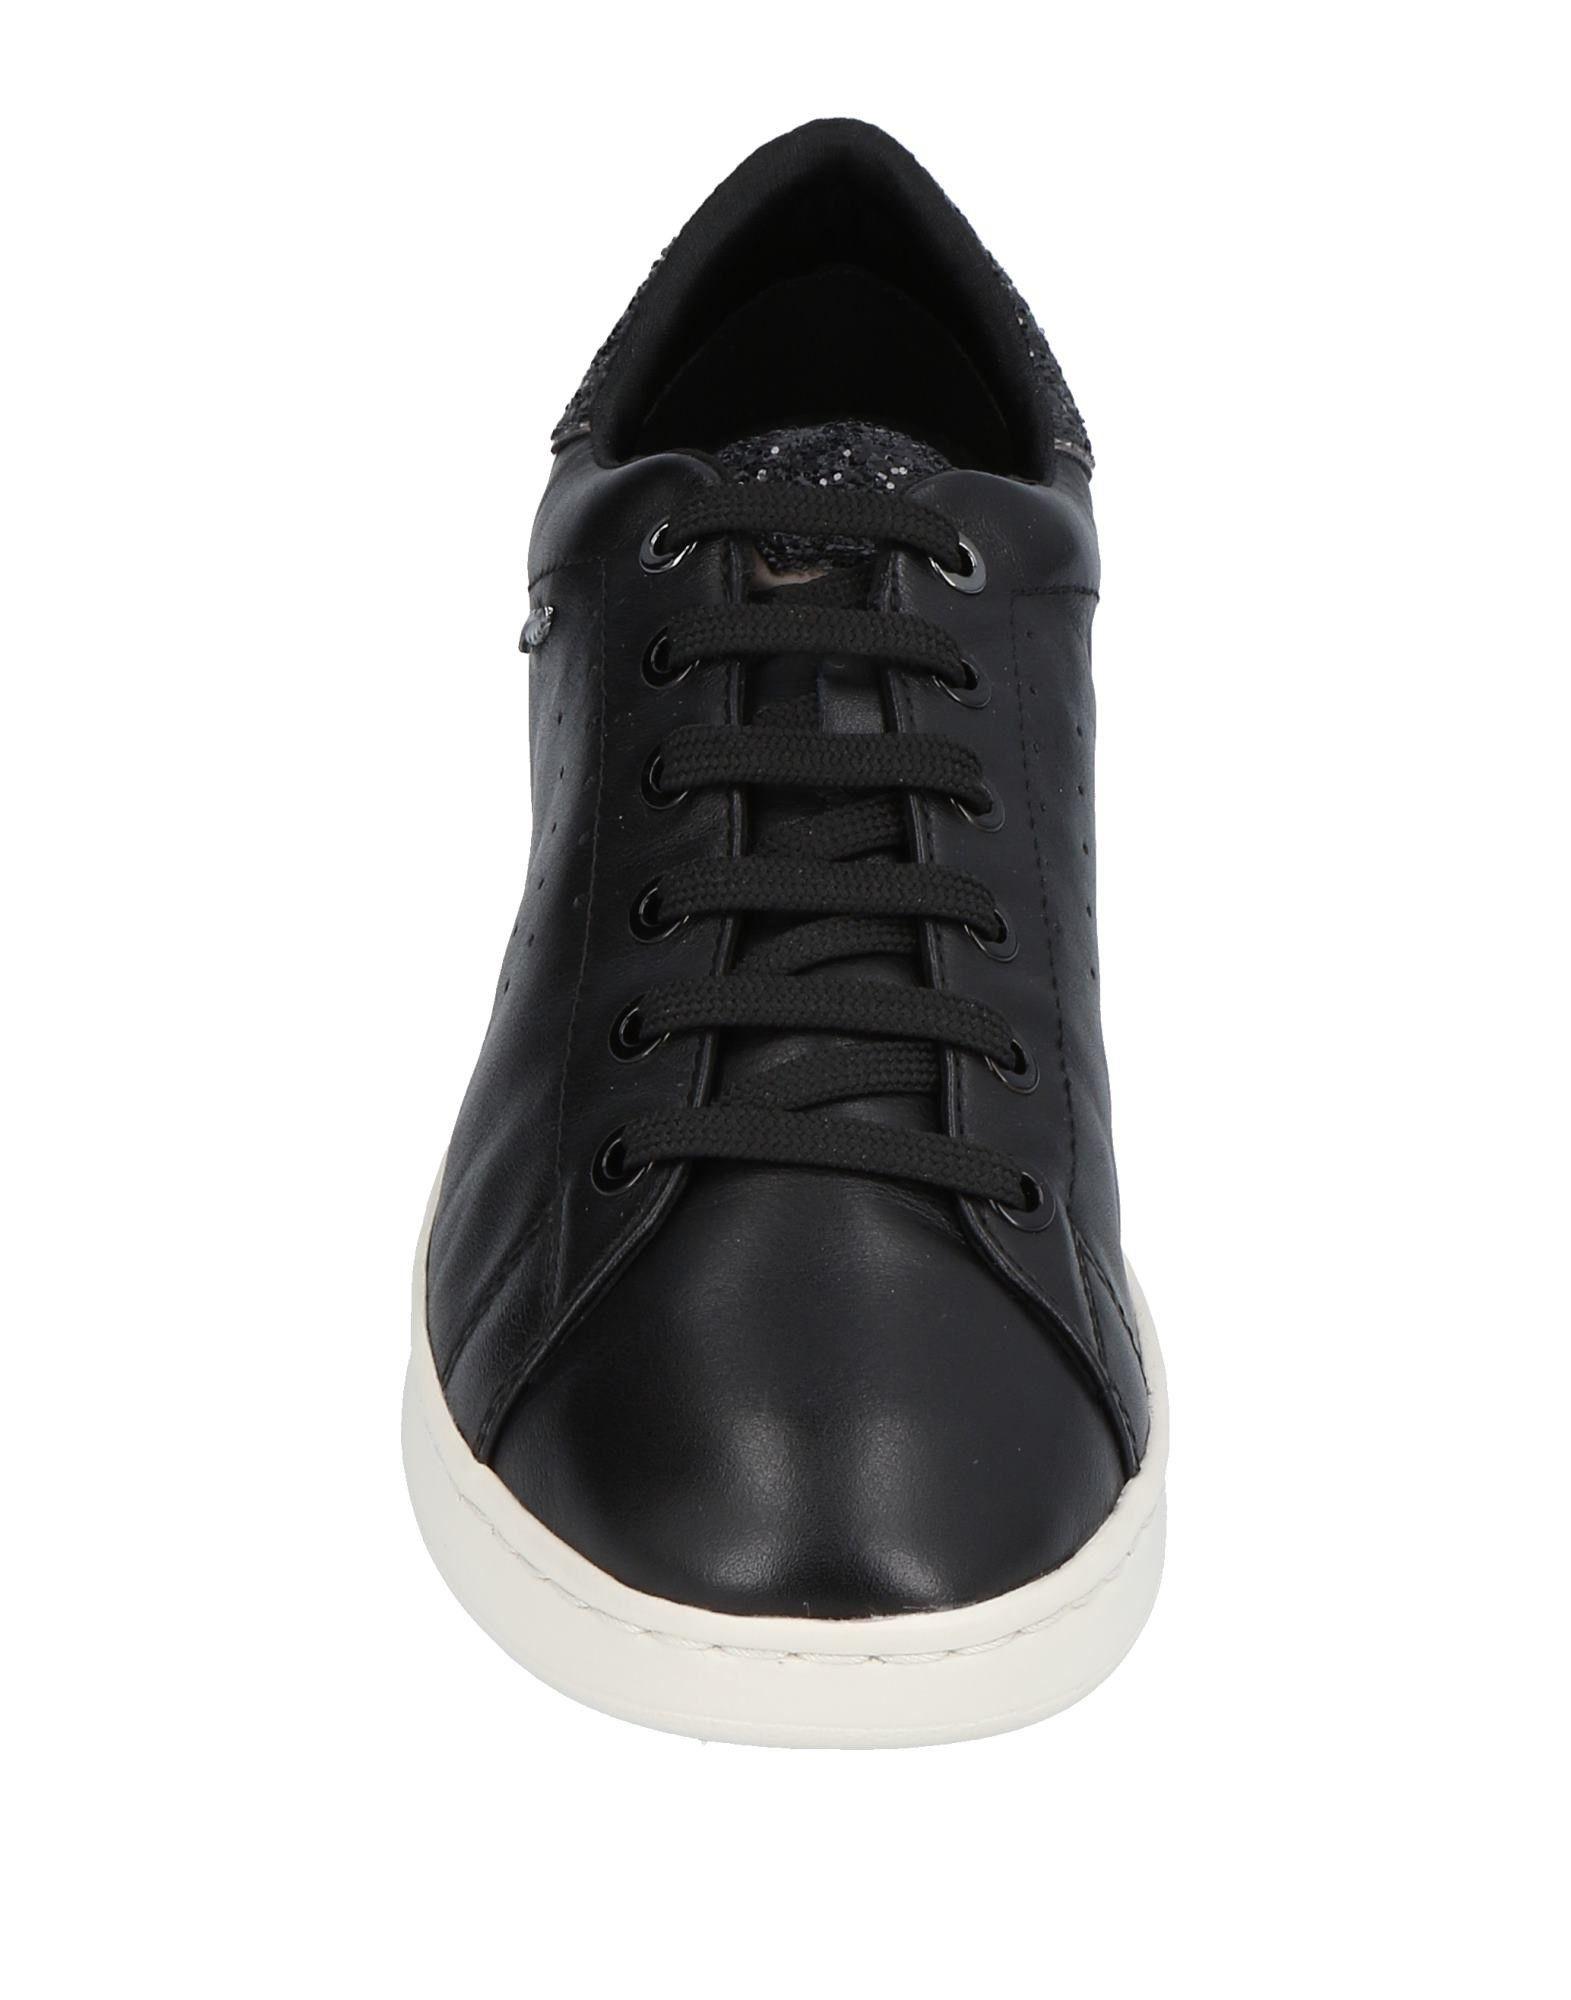 Geox Sneakers Damen  11465233EI Gute Qualität beliebte Schuhe Schuhe Schuhe 48bfbf